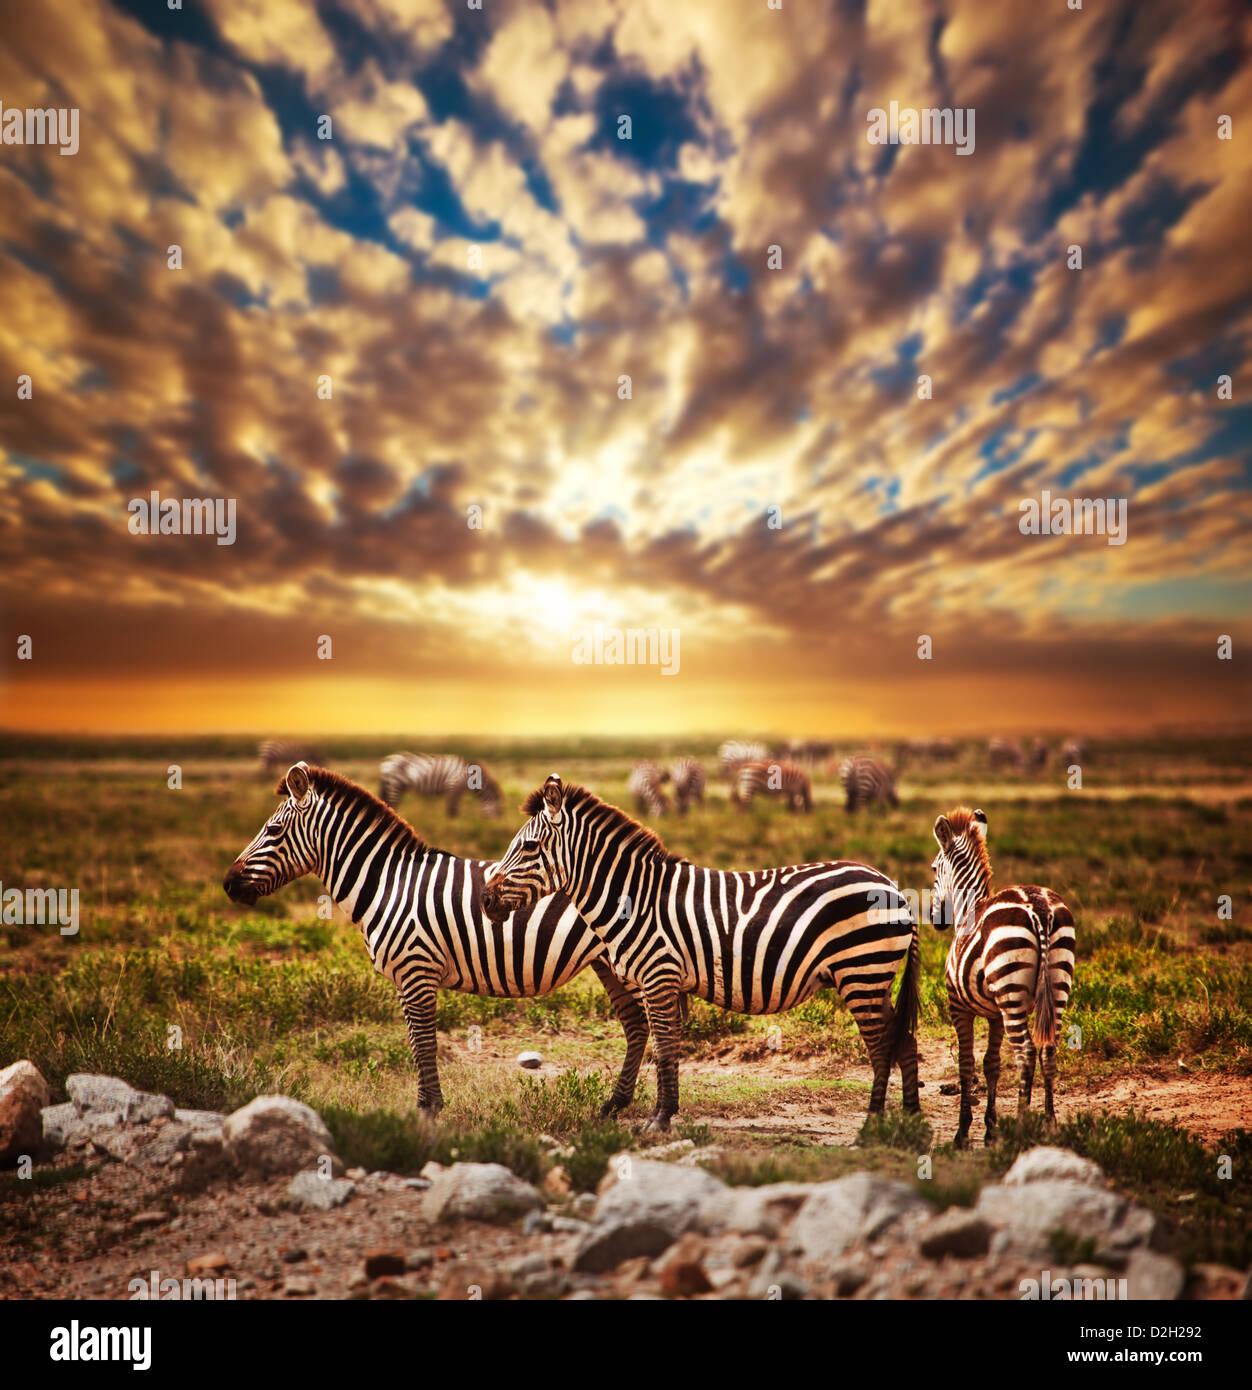 Zebras herd on savanna at sunset, Africa. Safari in Serengeti National Park, Tanzania Stock Photo